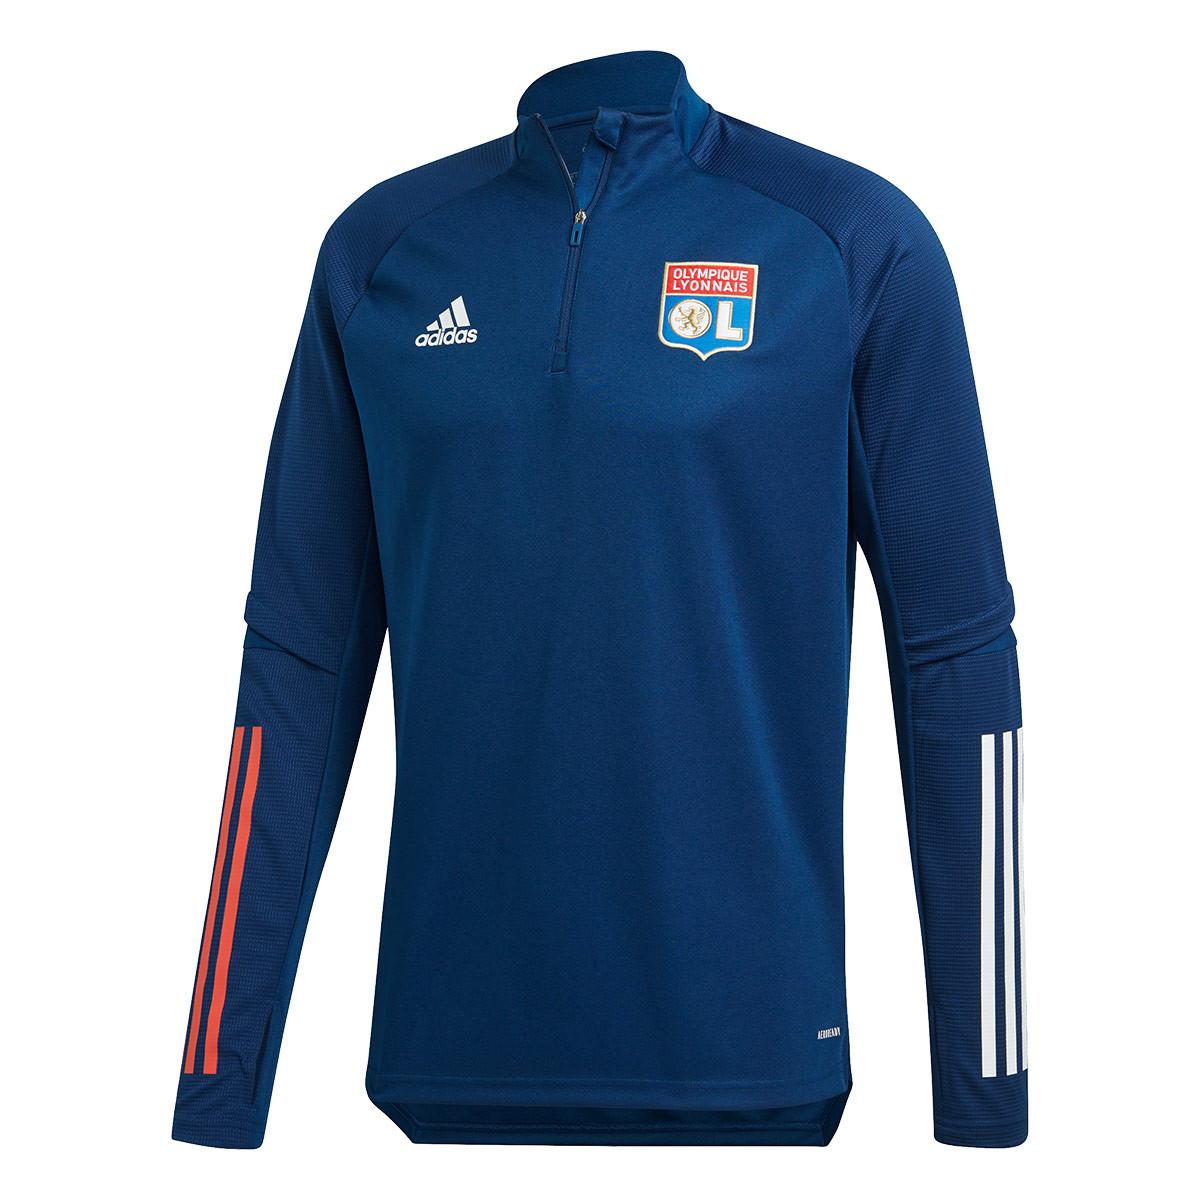 deshonesto parcialidad servidor  Sweatshirt adidas Olympique Lyon Training 2020-2021 Mystery blue - Football  store Fútbol Emotion